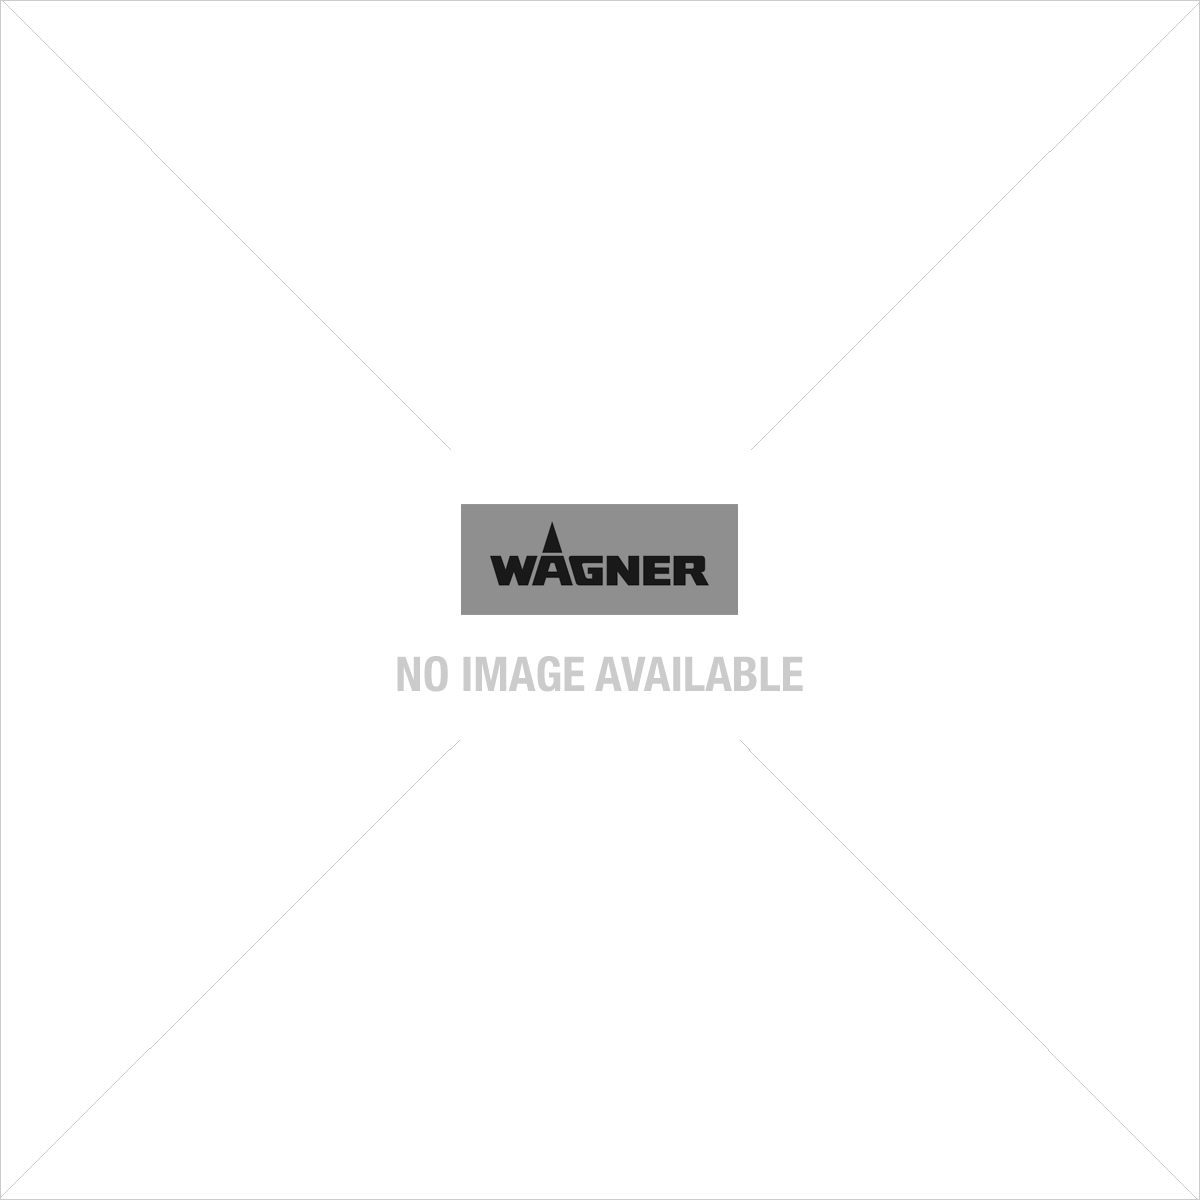 Wagner Wood & Metal Sprayer W 300